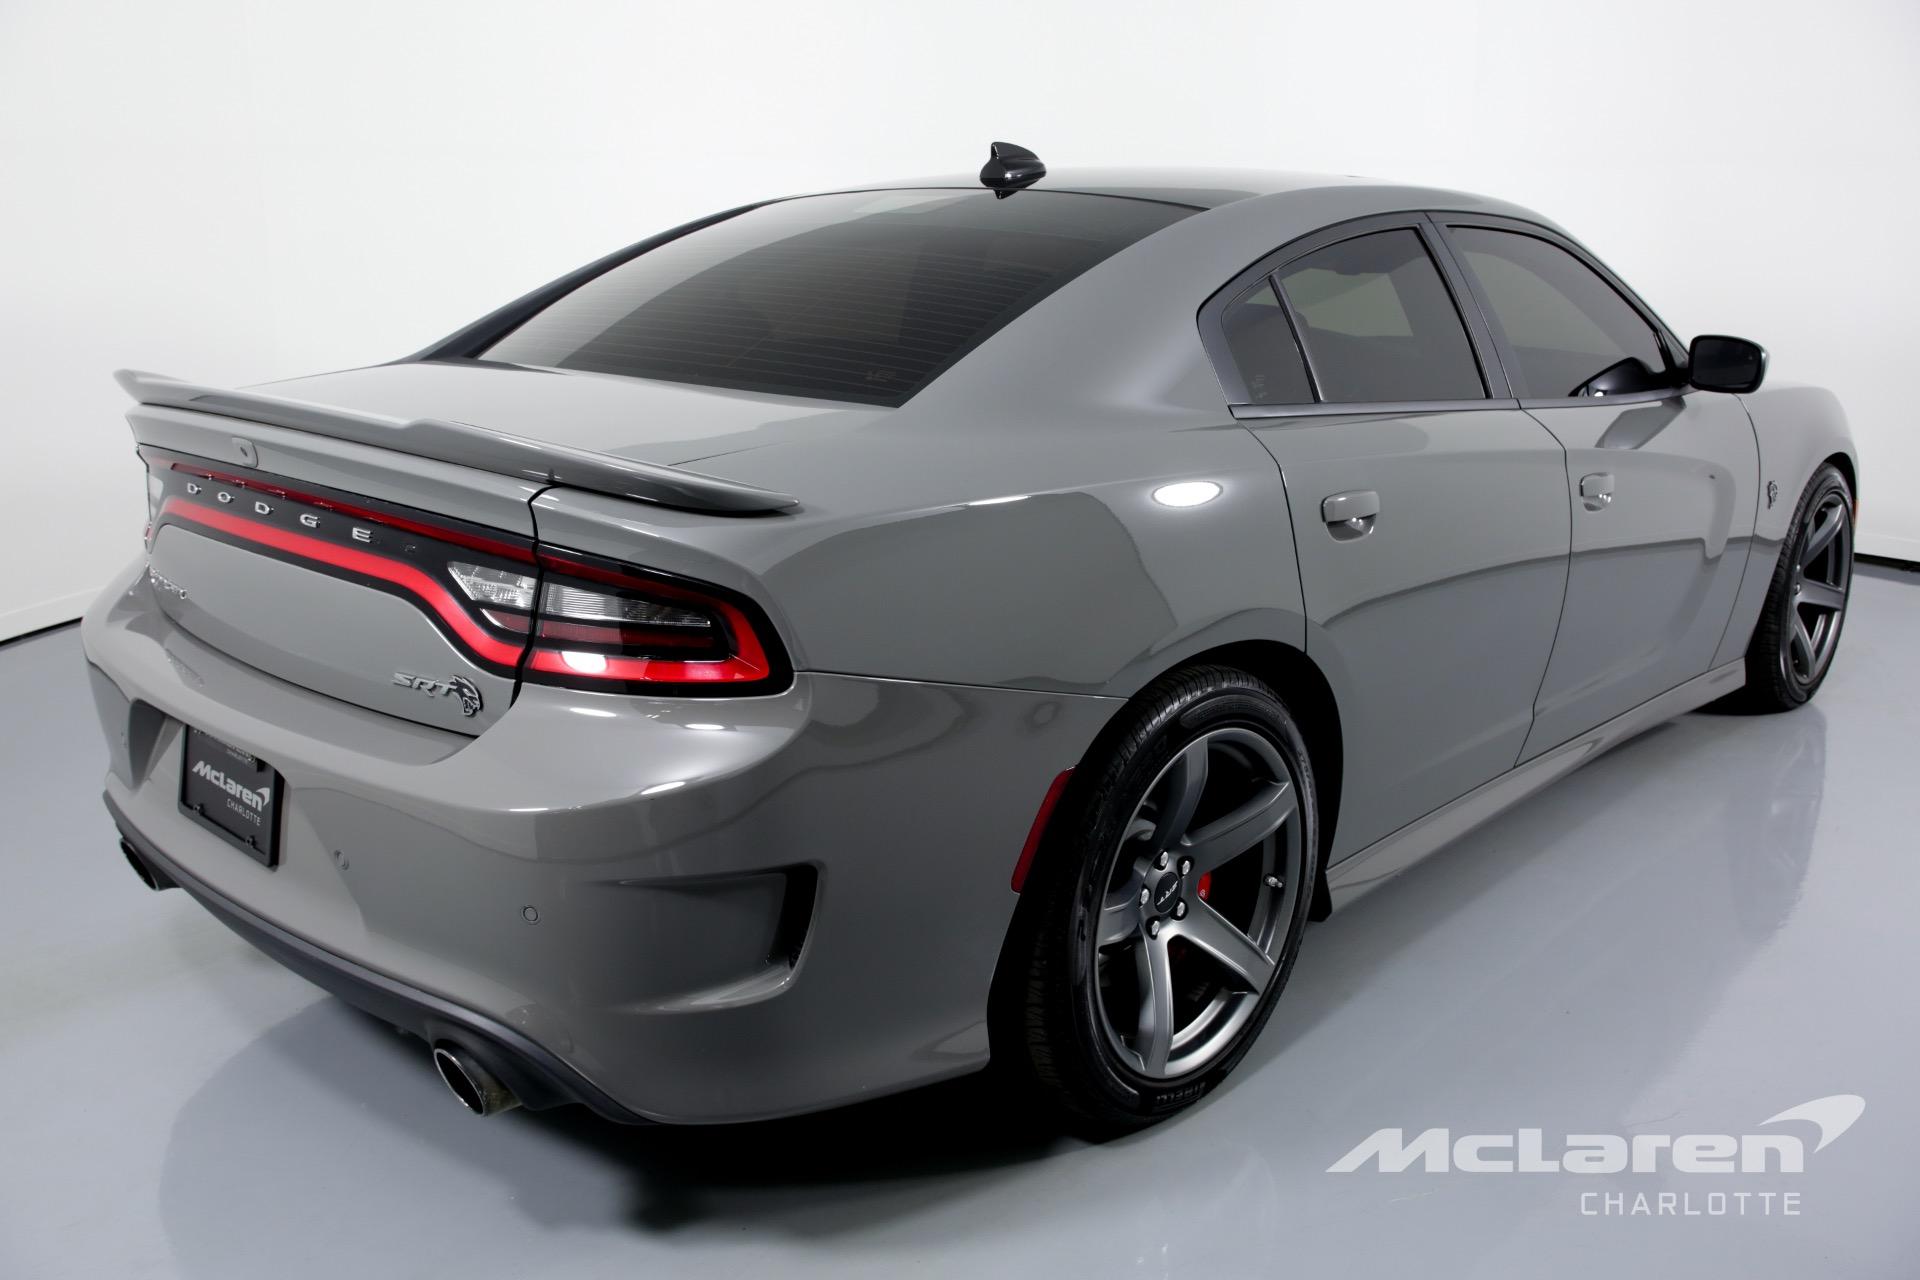 Dodge Charger Srt Hellcat >> Used 2018 Dodge Charger Srt Hellcat For Sale 63 996